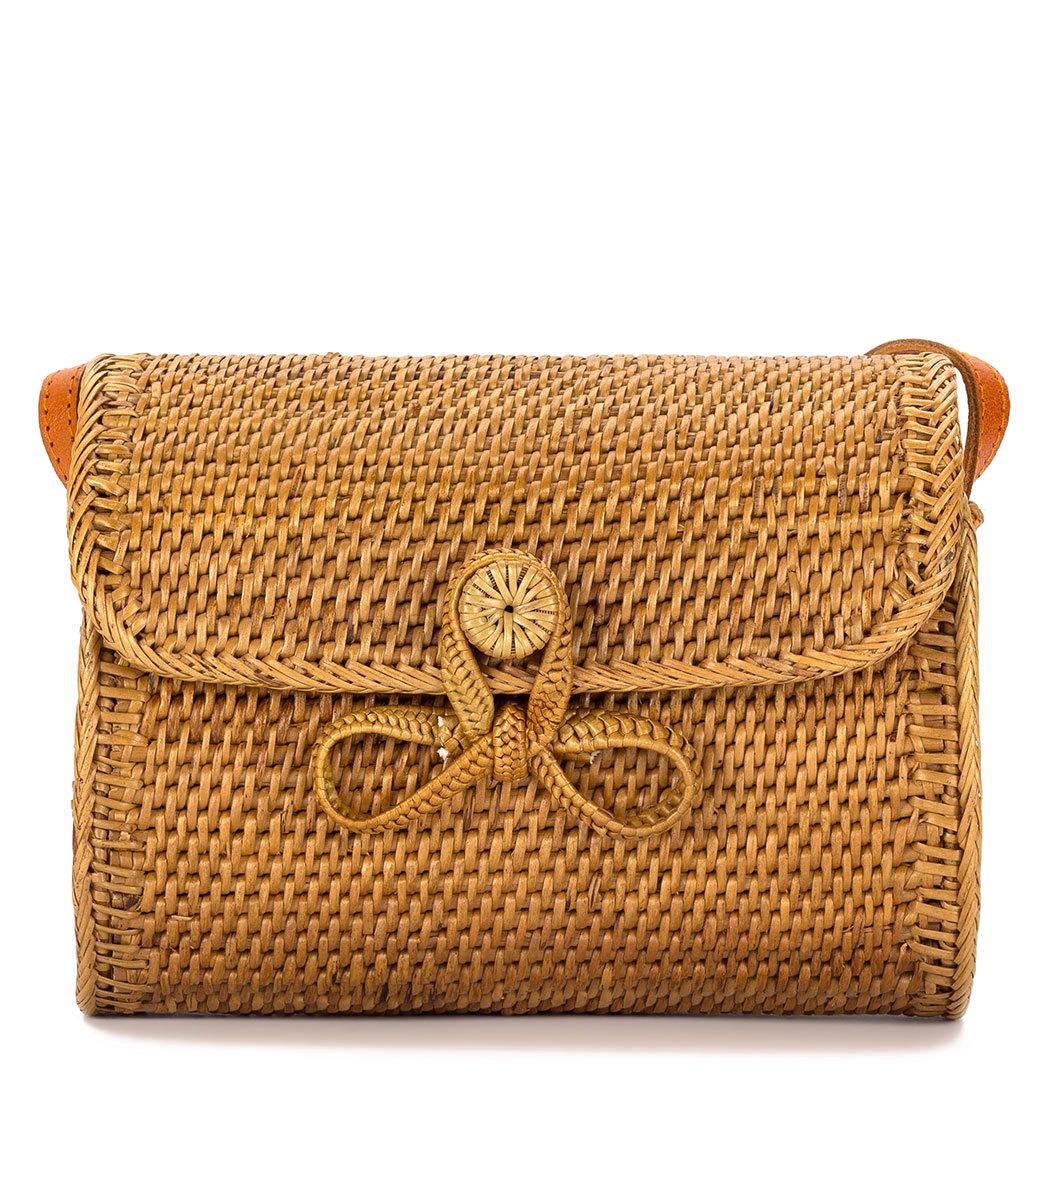 BEMBIEN Lily Bag in Natural